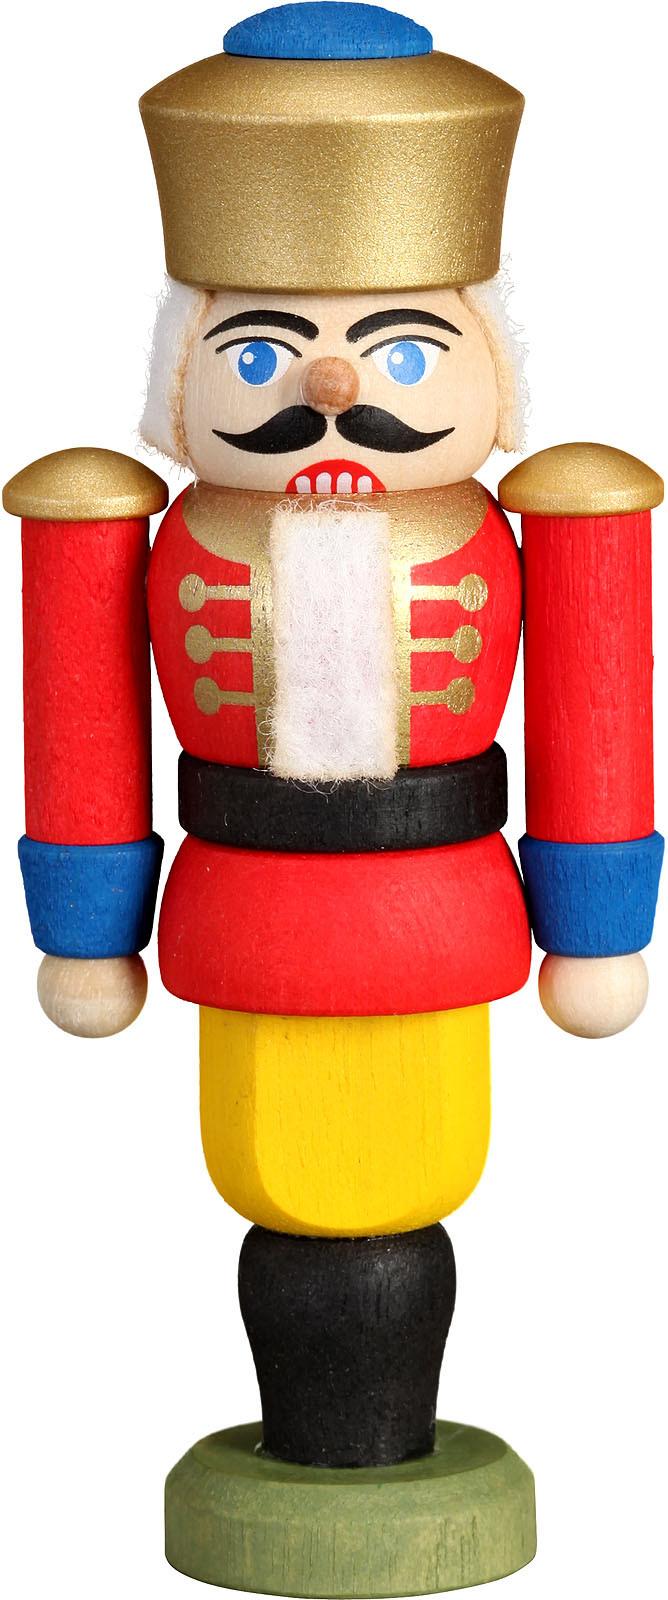 Mini-Nussknacker König, rot